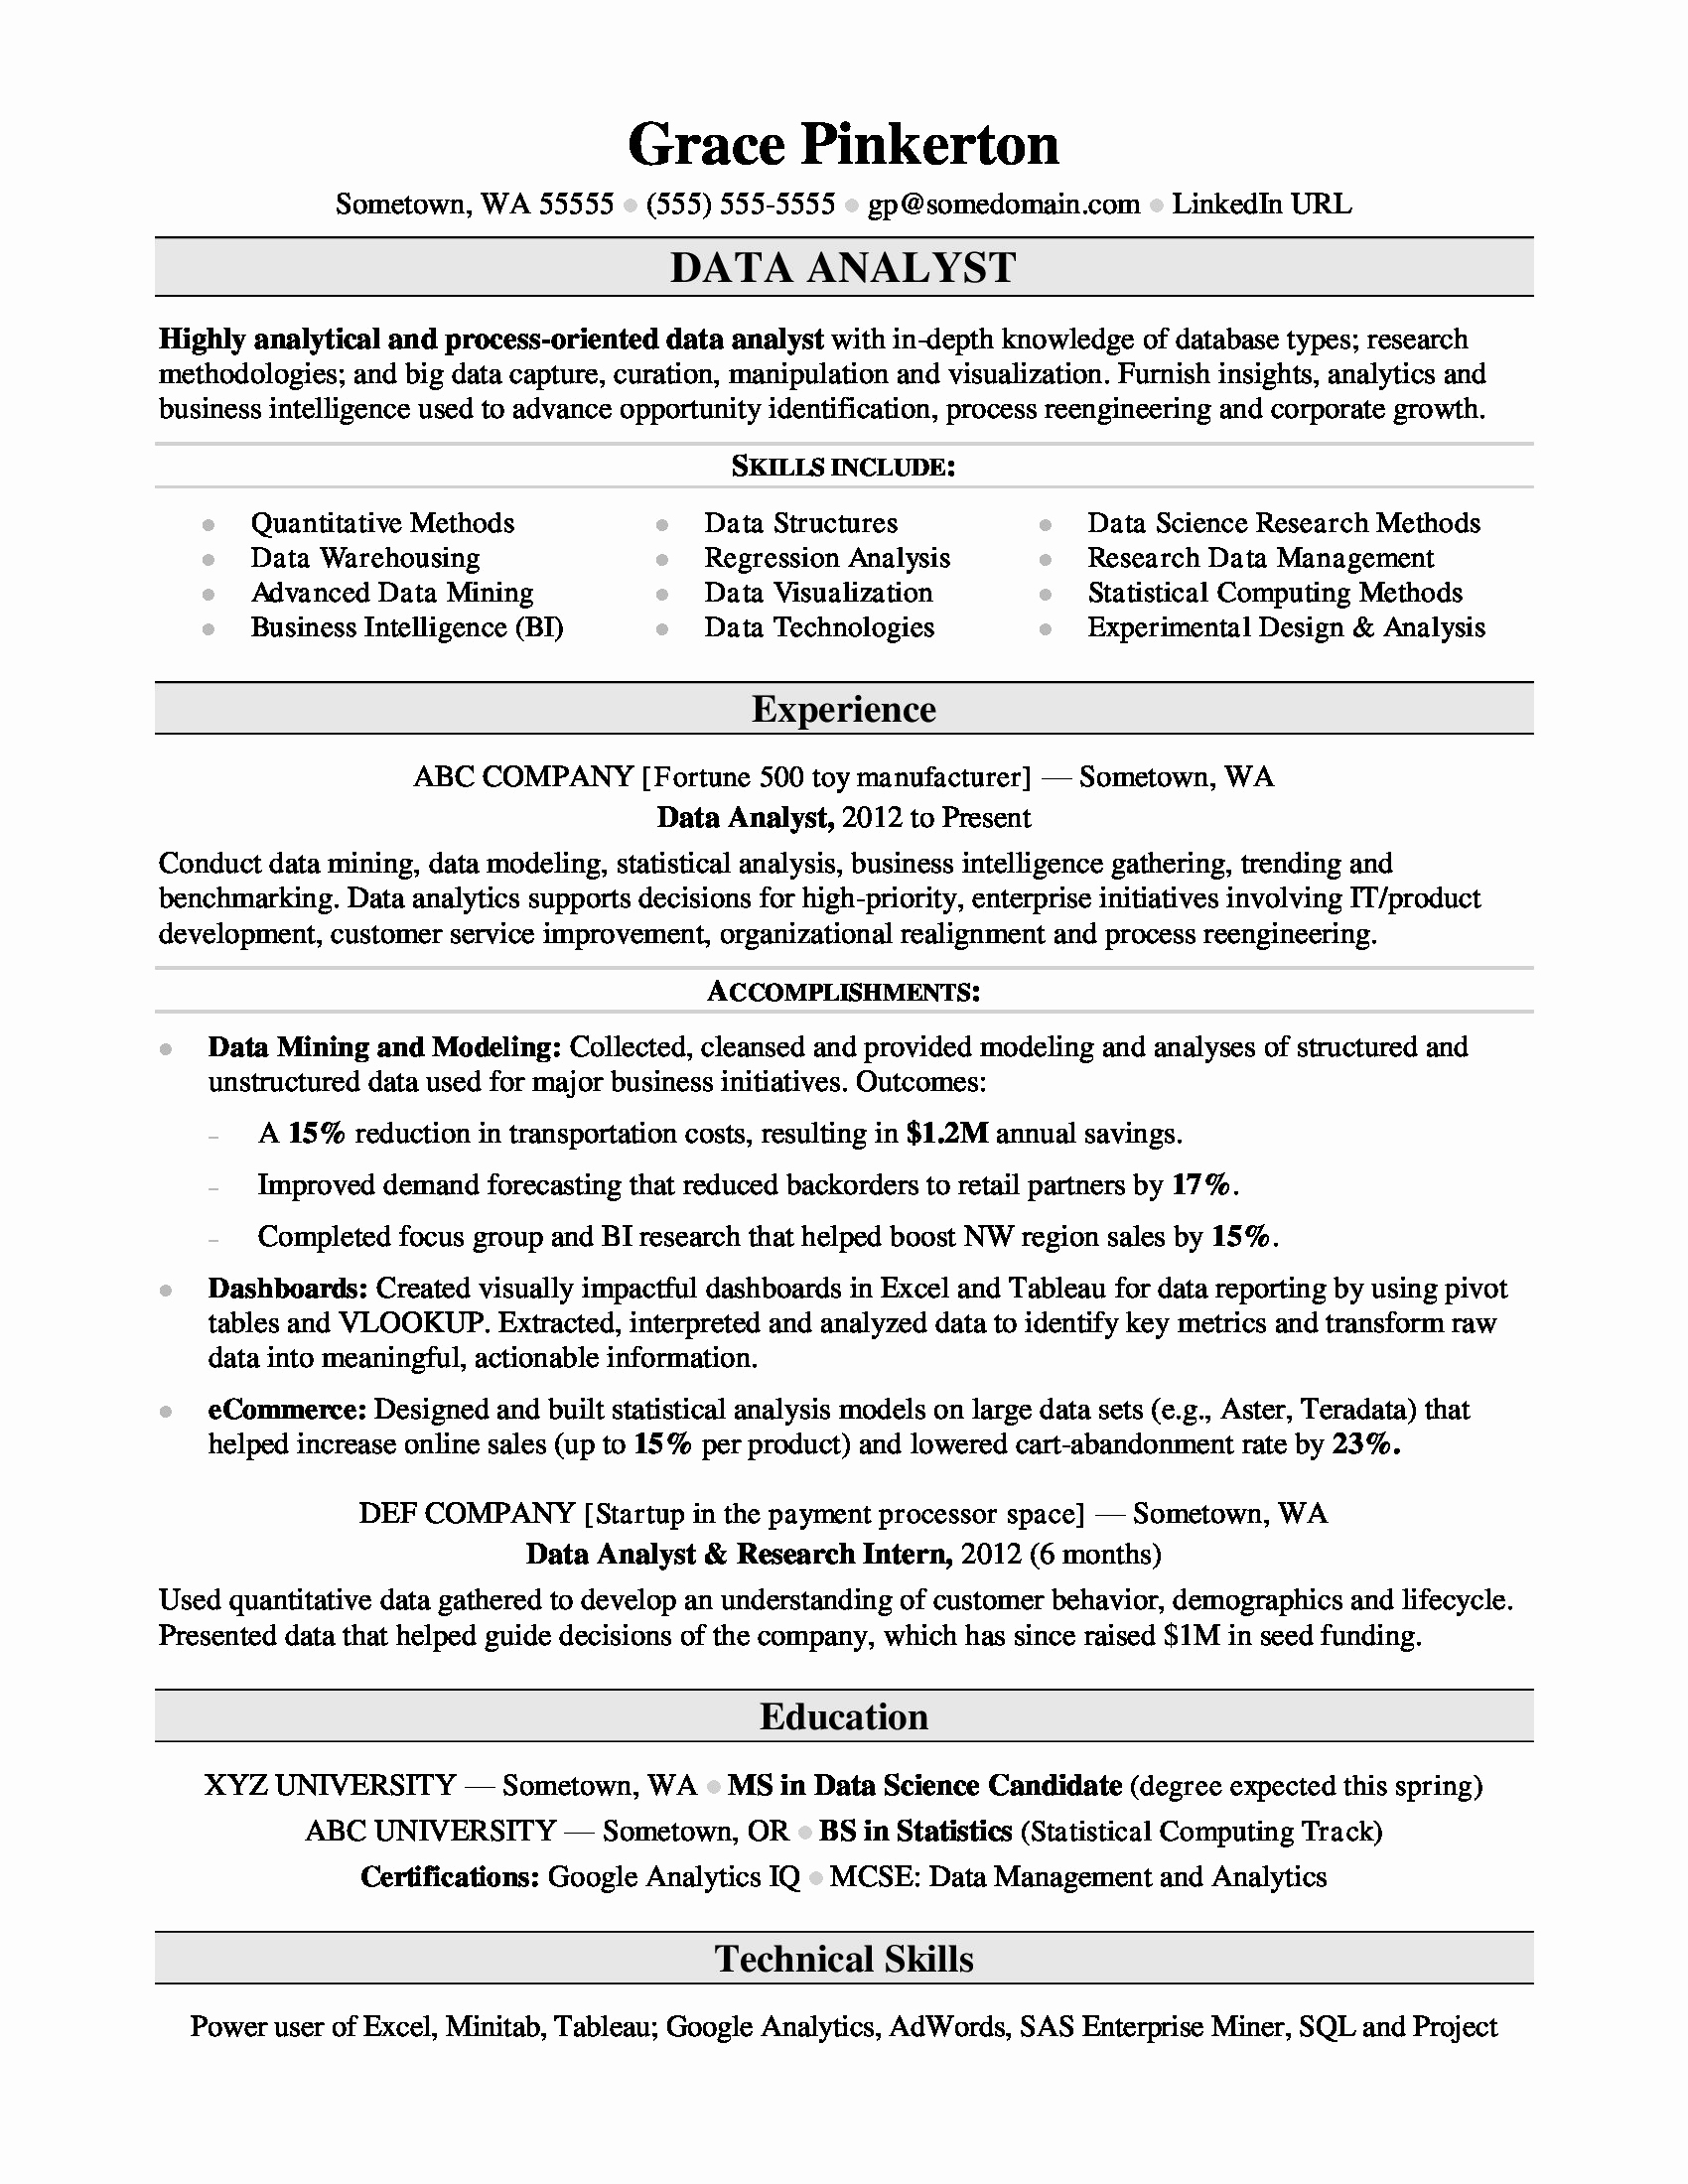 Data Analyst Resume Entry Level Awesome Data Analyst Resume Sample